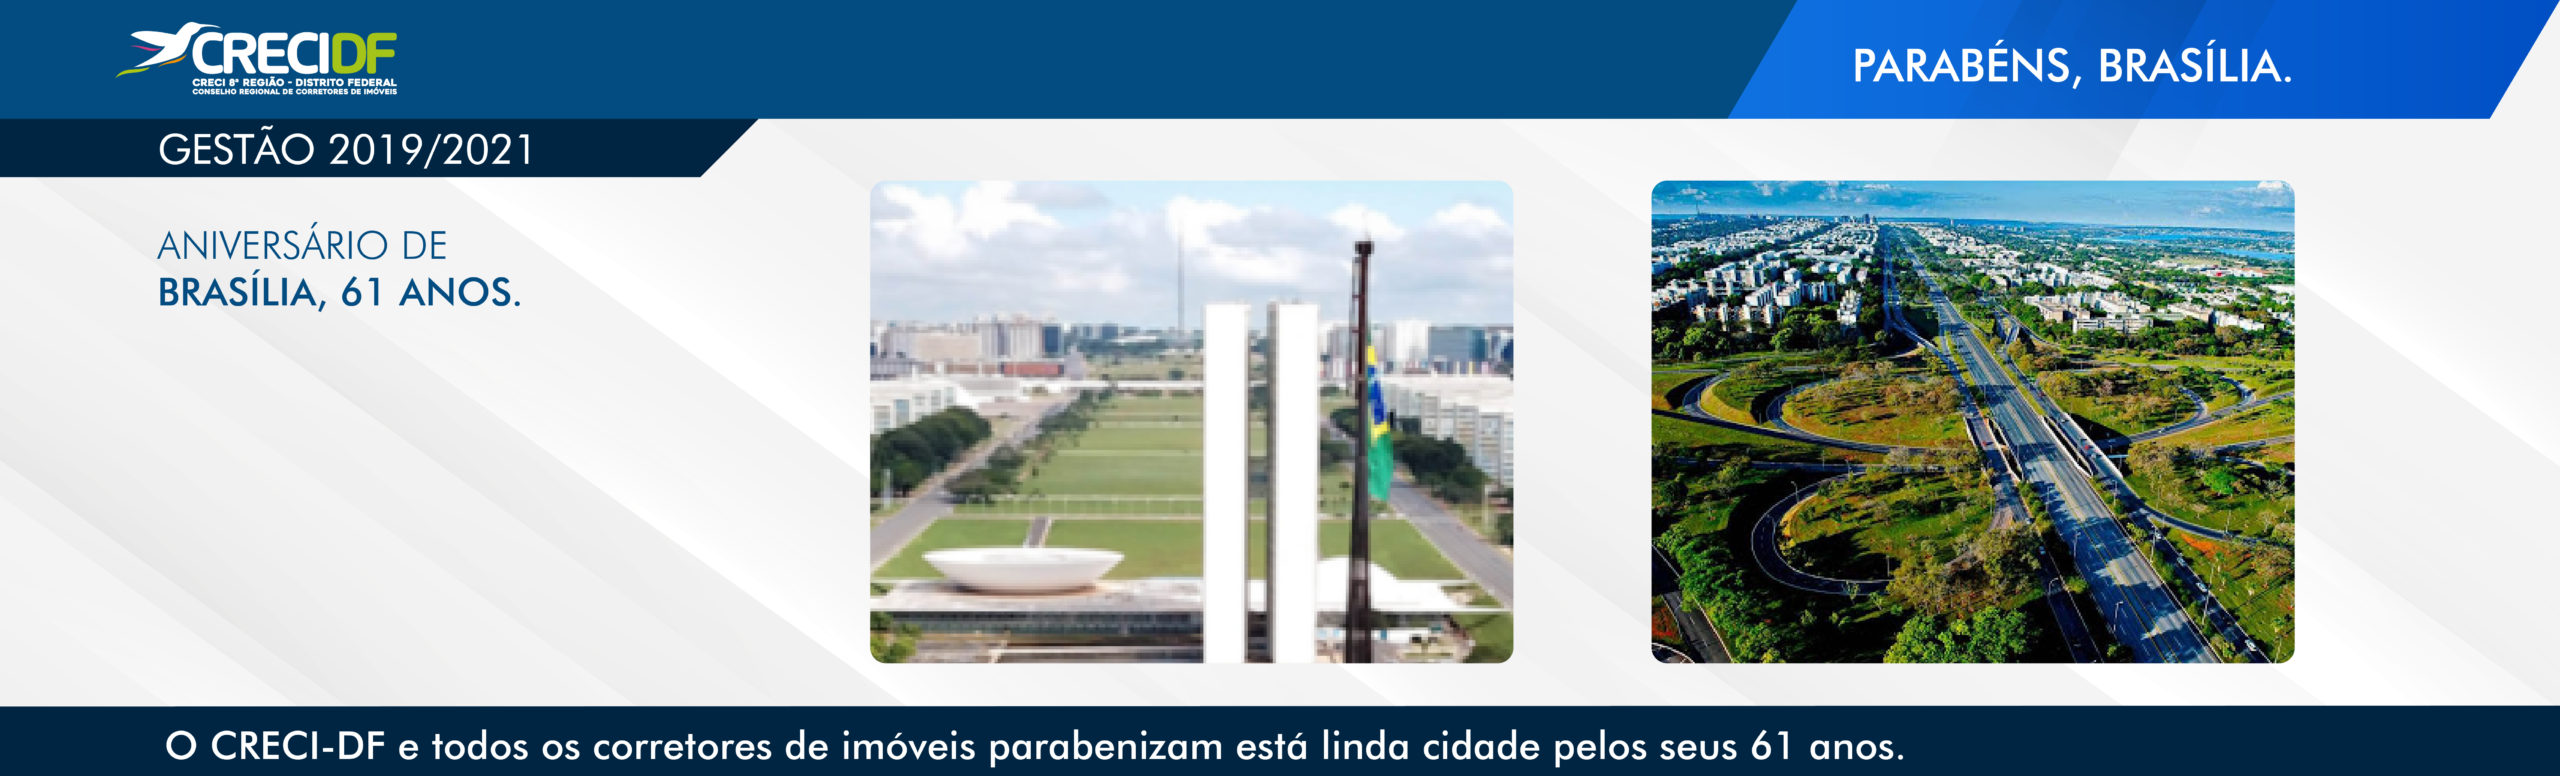 BRASILIA 61 ANOS SITE